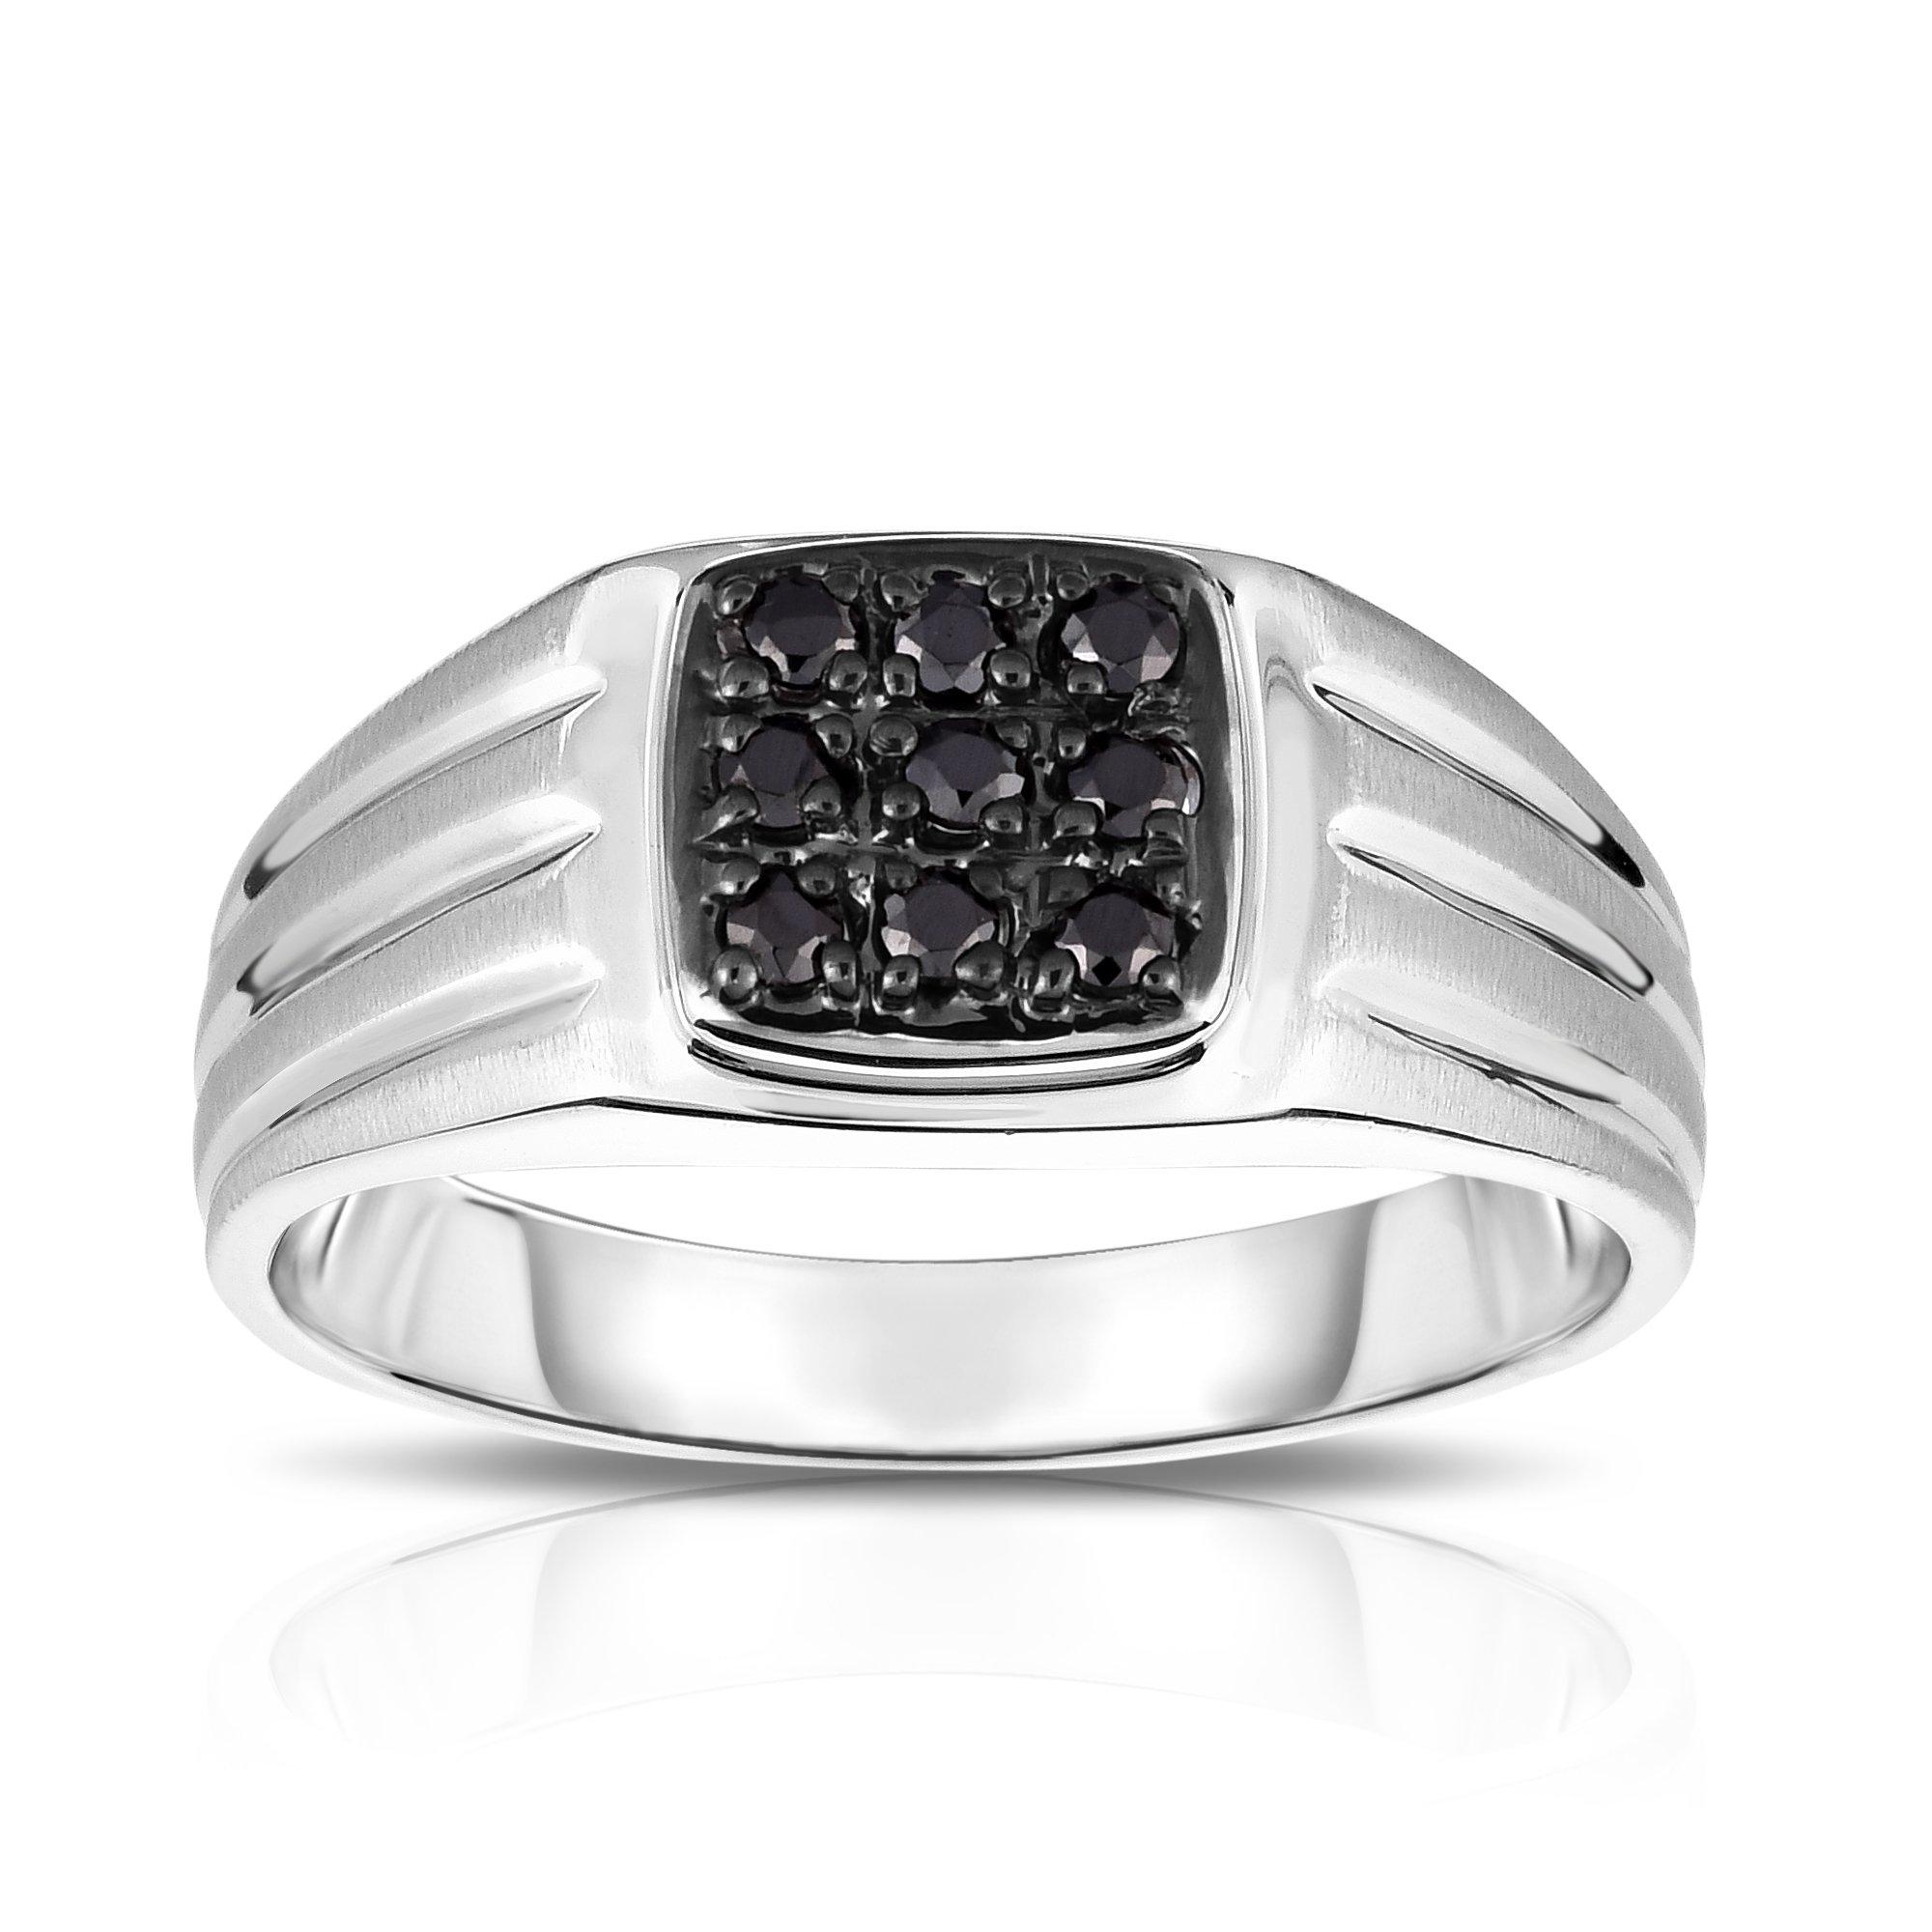 Noray Designs 14K White Gold Diamond (0.24 Ct, I1-I2 Clarity, Black Color) Men's 9-Stone Ring